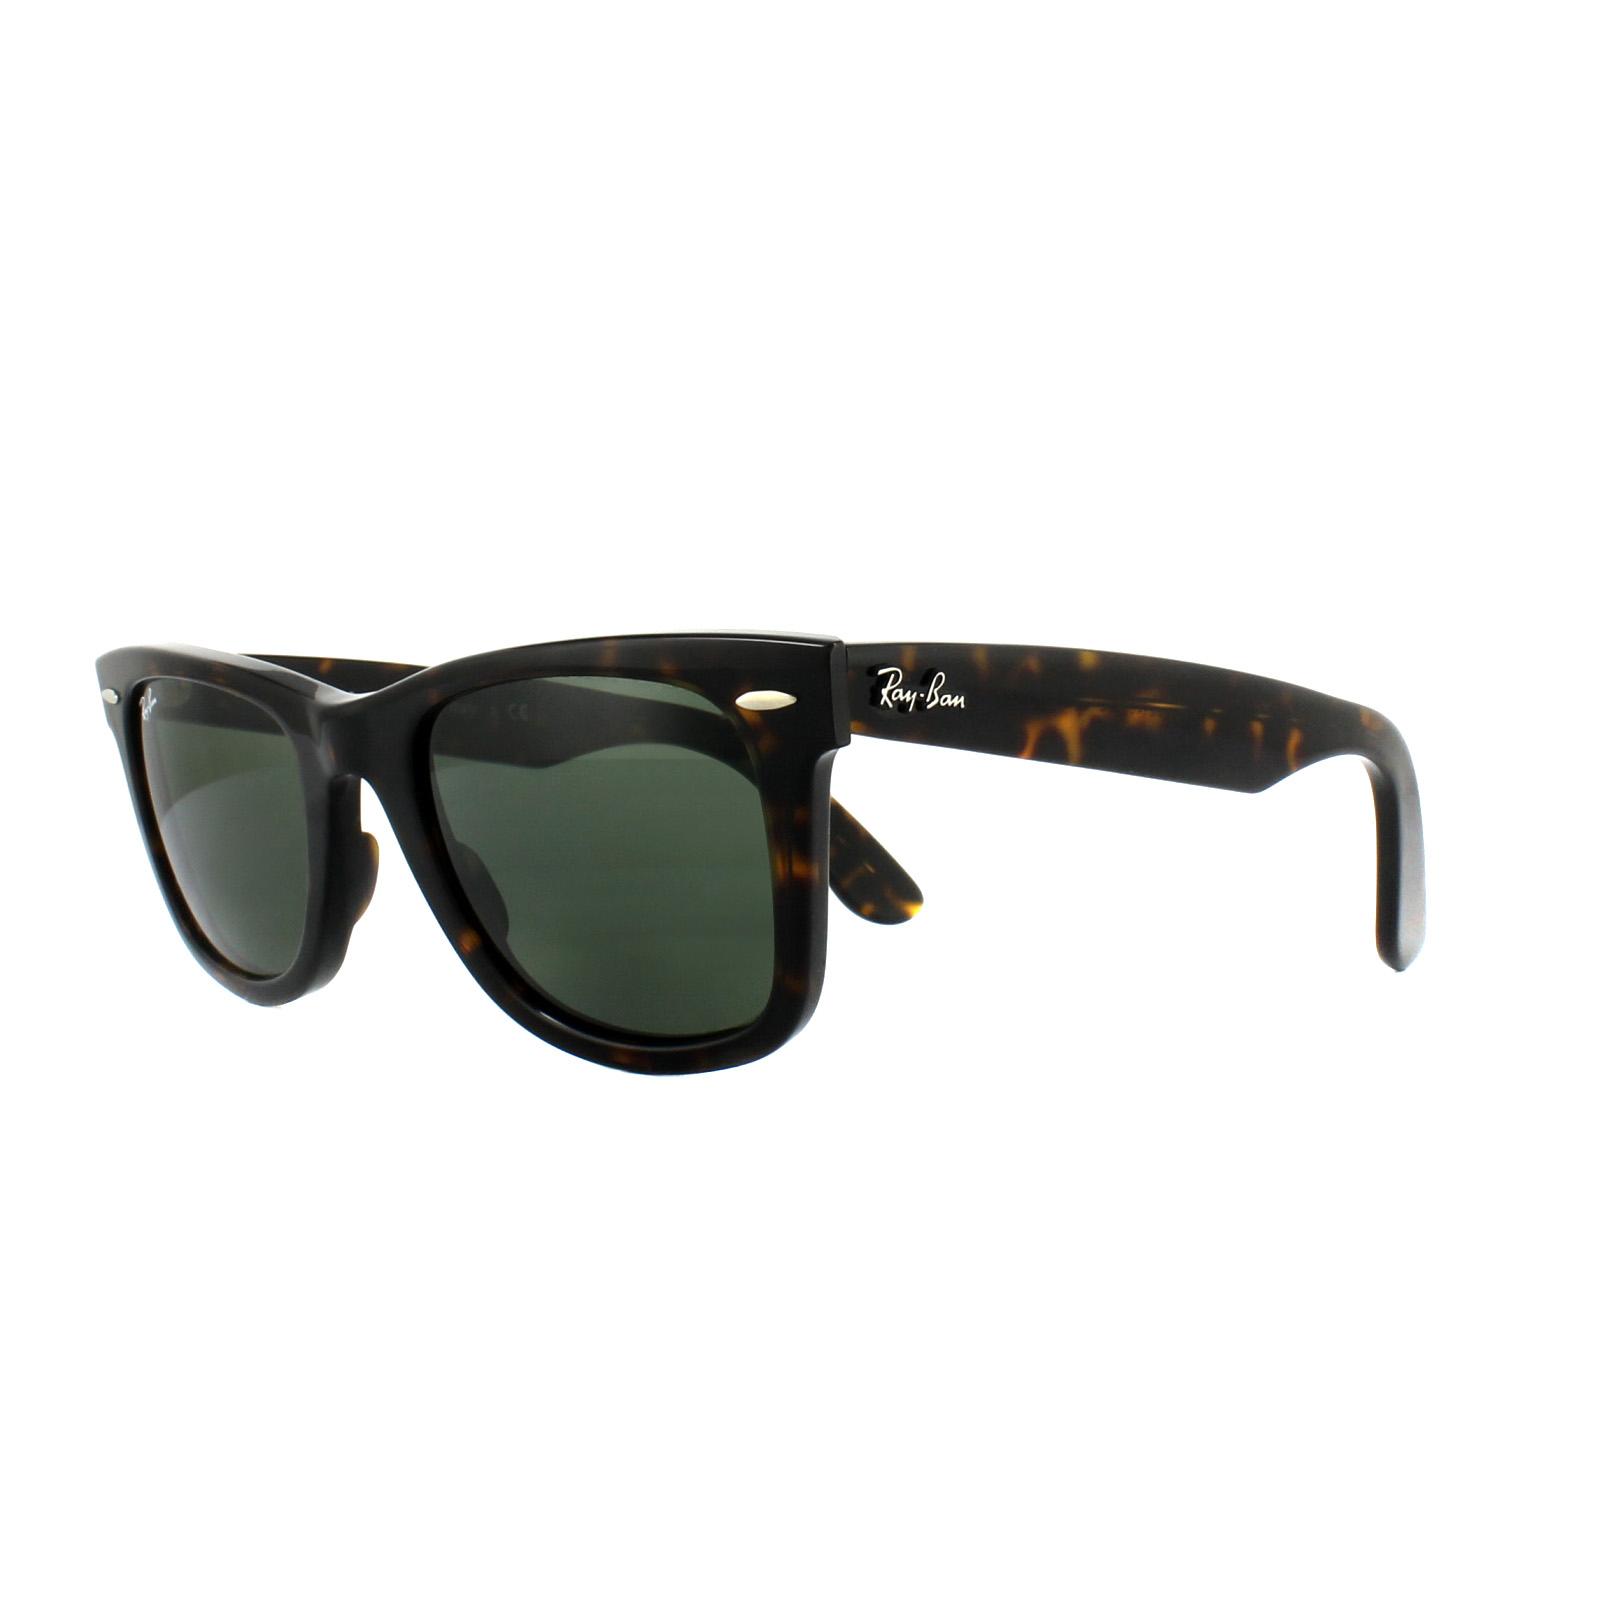 cheap ray ban wayfarer sunglasses